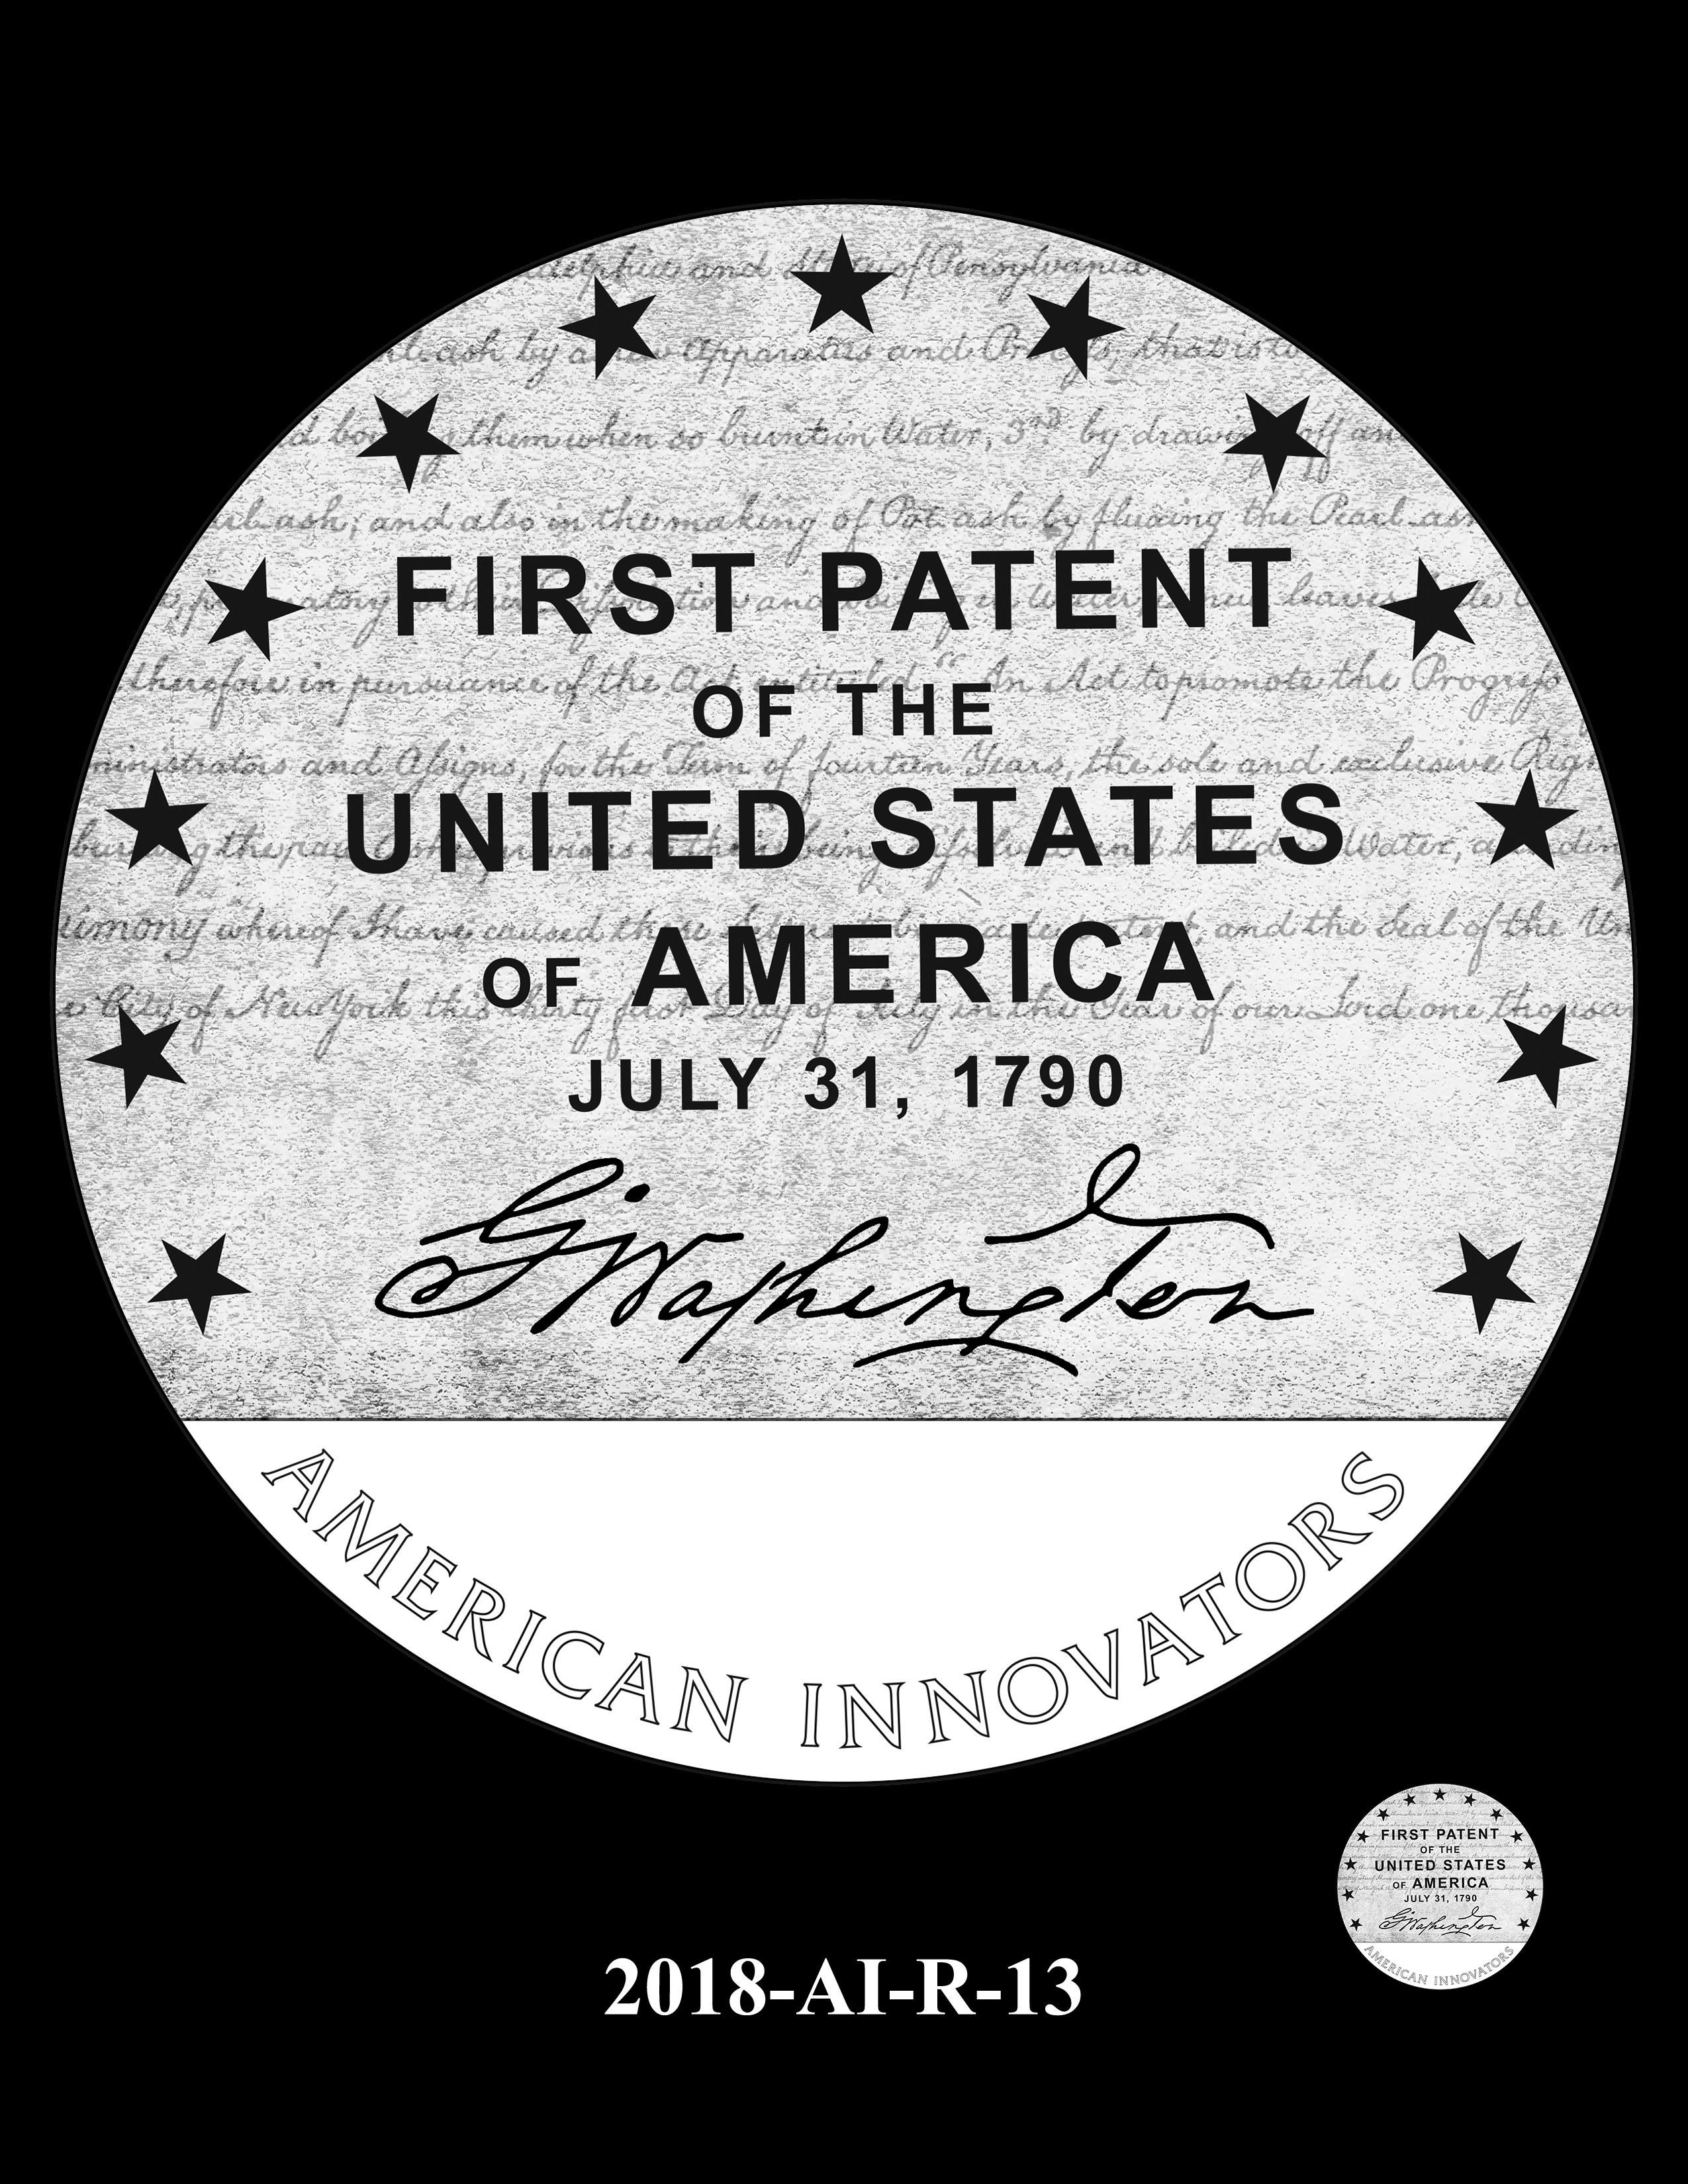 2018-AI-R-13 -- 2018 American Innovation $1 Coin